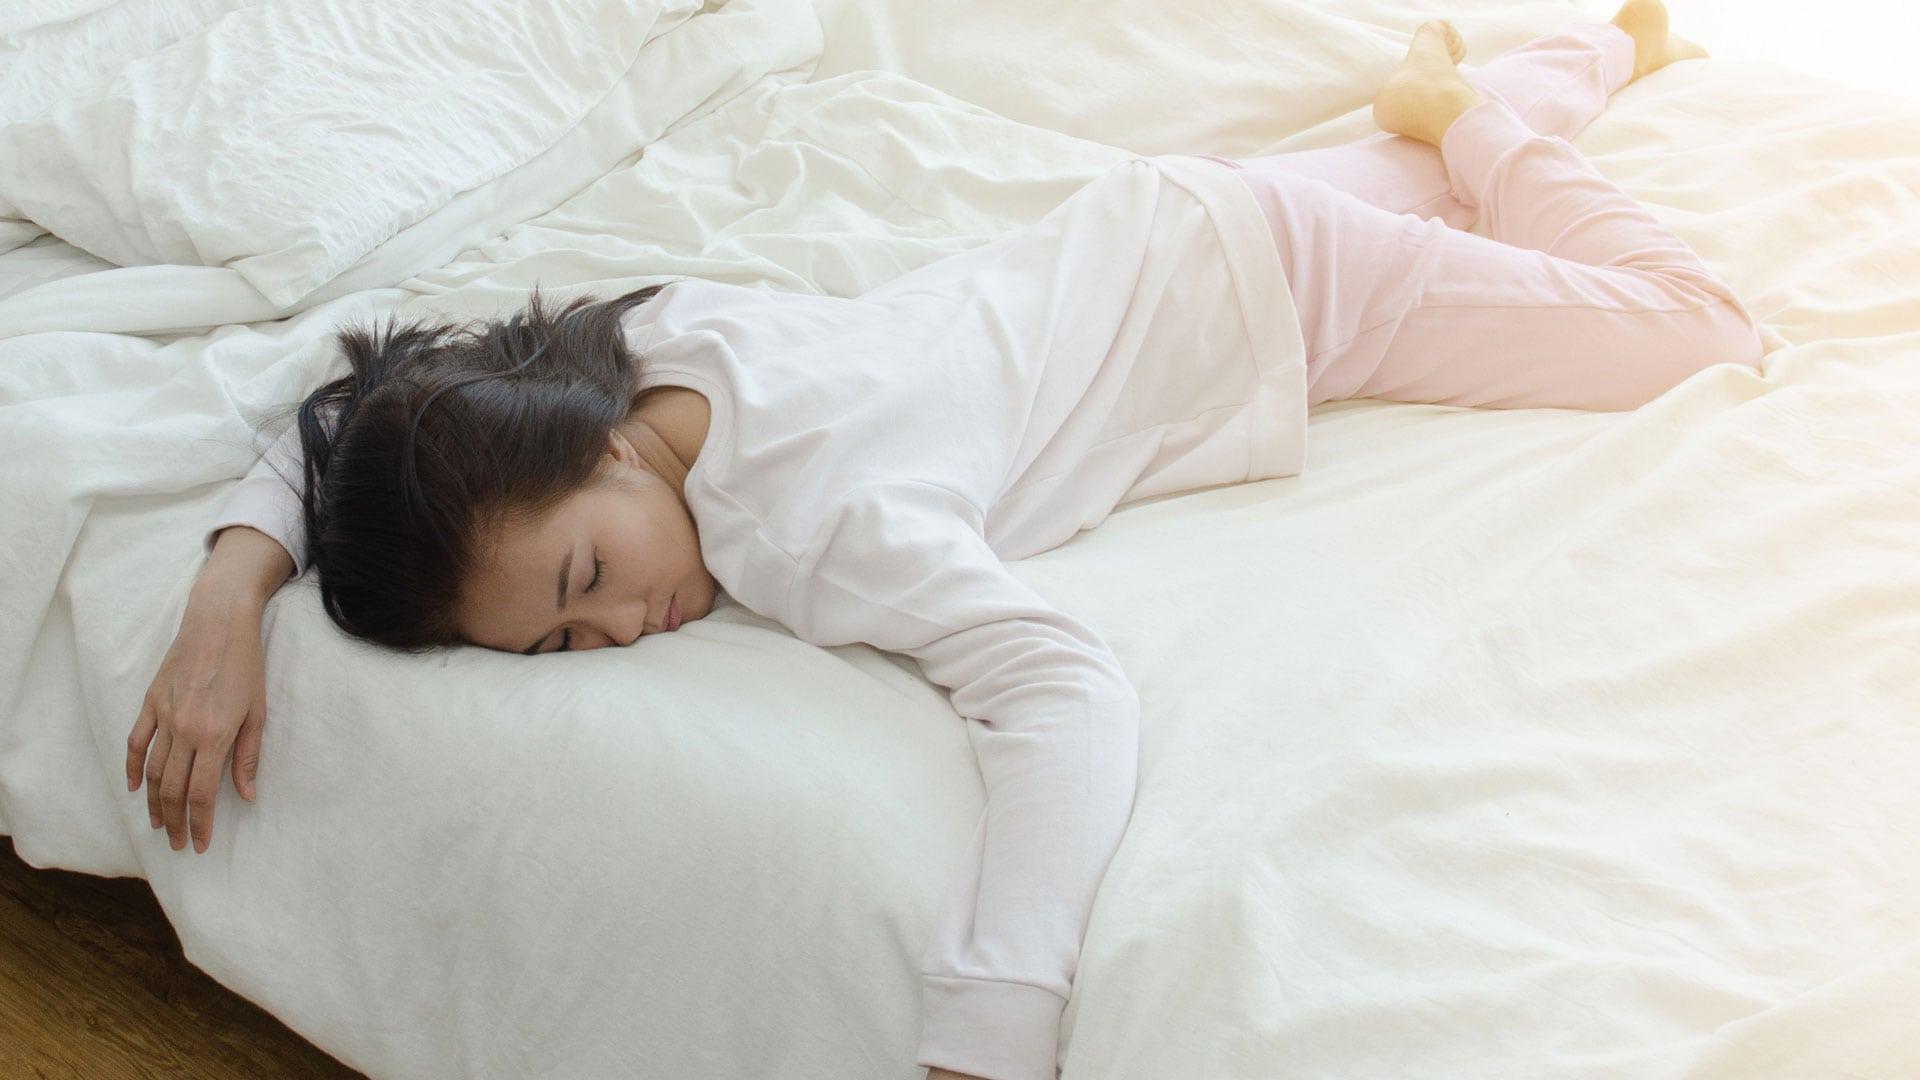 Epworth Sleepiness